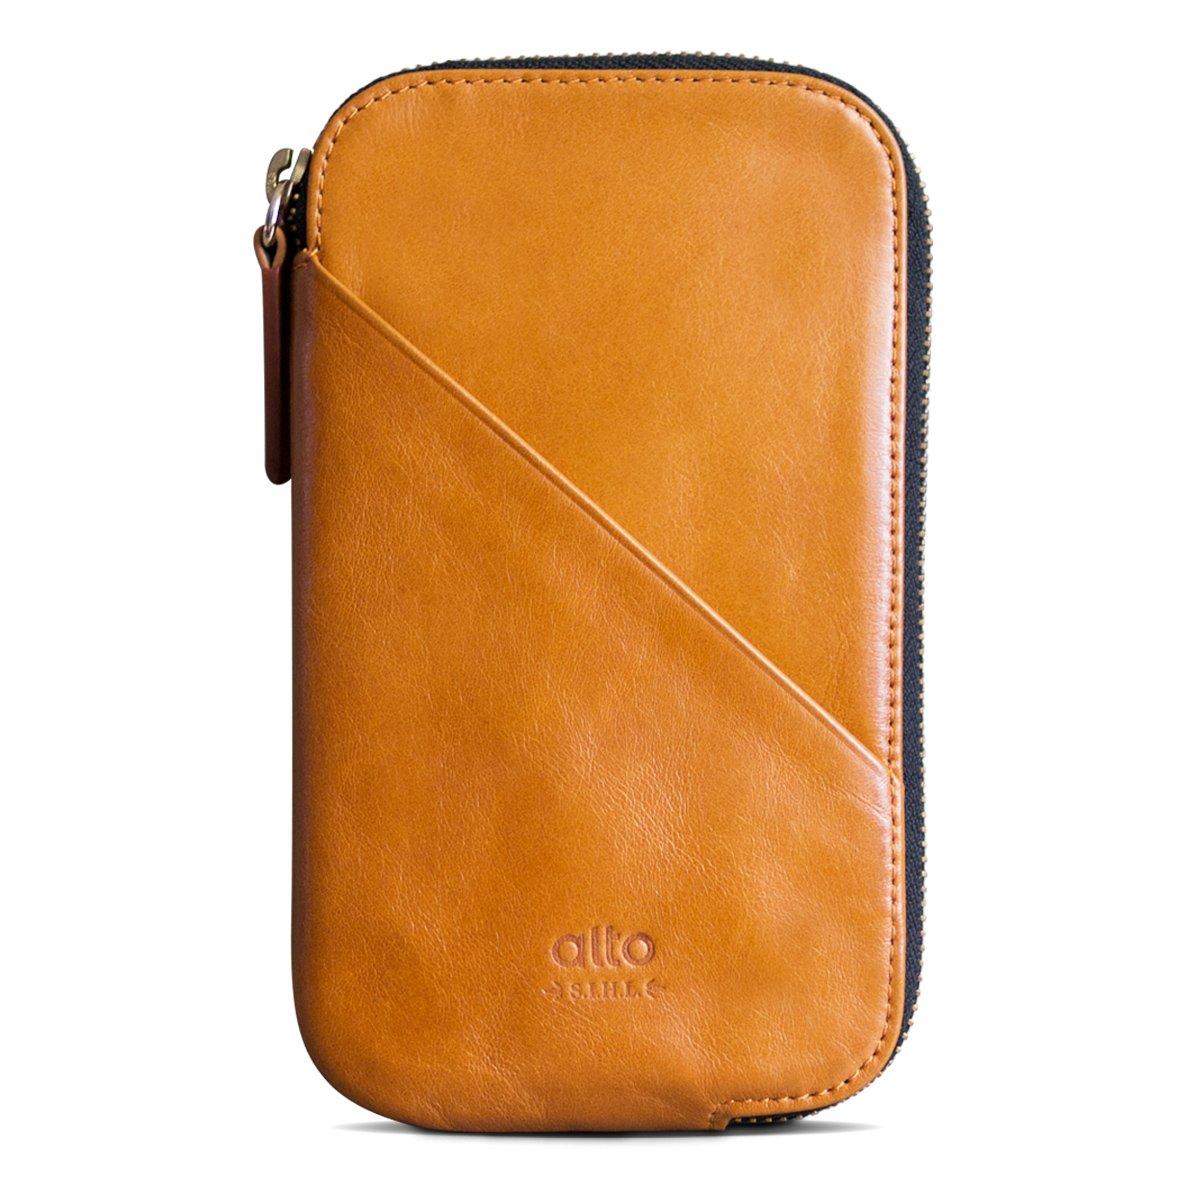 alto Handmade Premium Italian Leather for Apple iPhone 7 / iPhone 7 Plus / iPhone 8 / iPhone 8 Plus / iPhone X Travel Phone Wallet (Caramel)